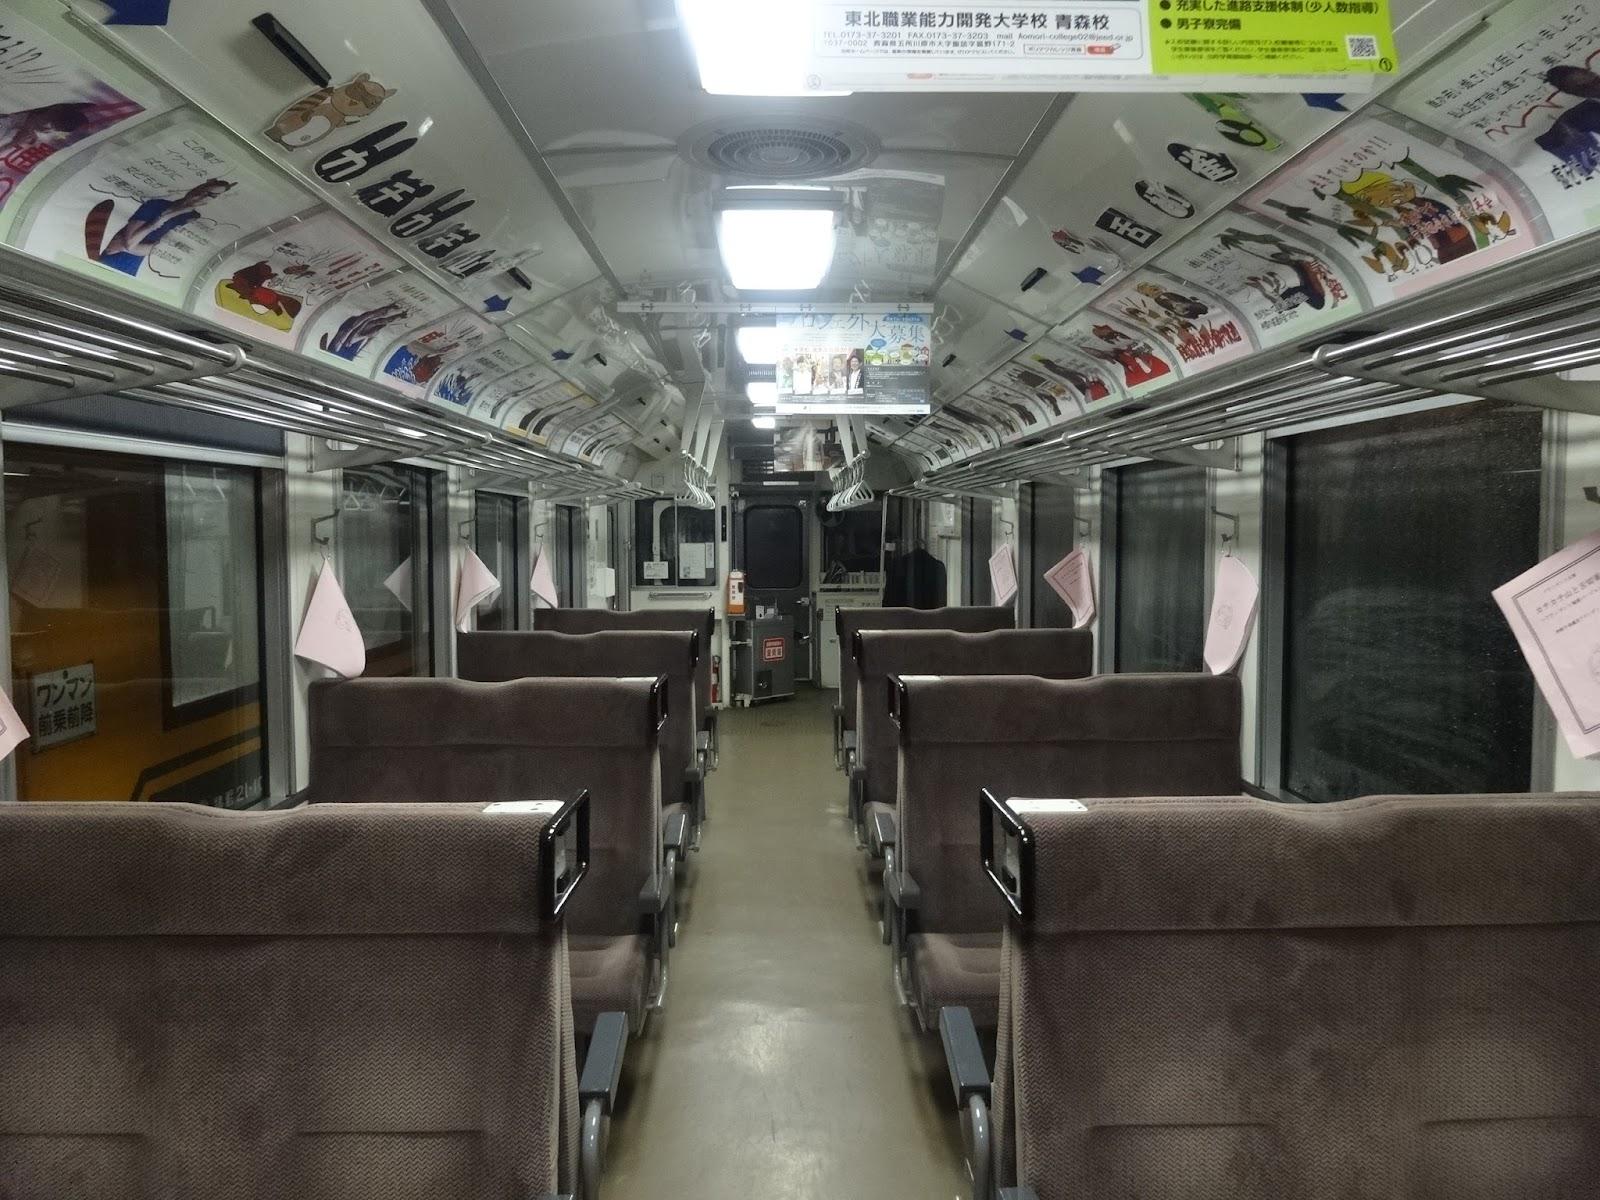 津軽鉄道〈著作権フリー画像〉Free Stock Photos